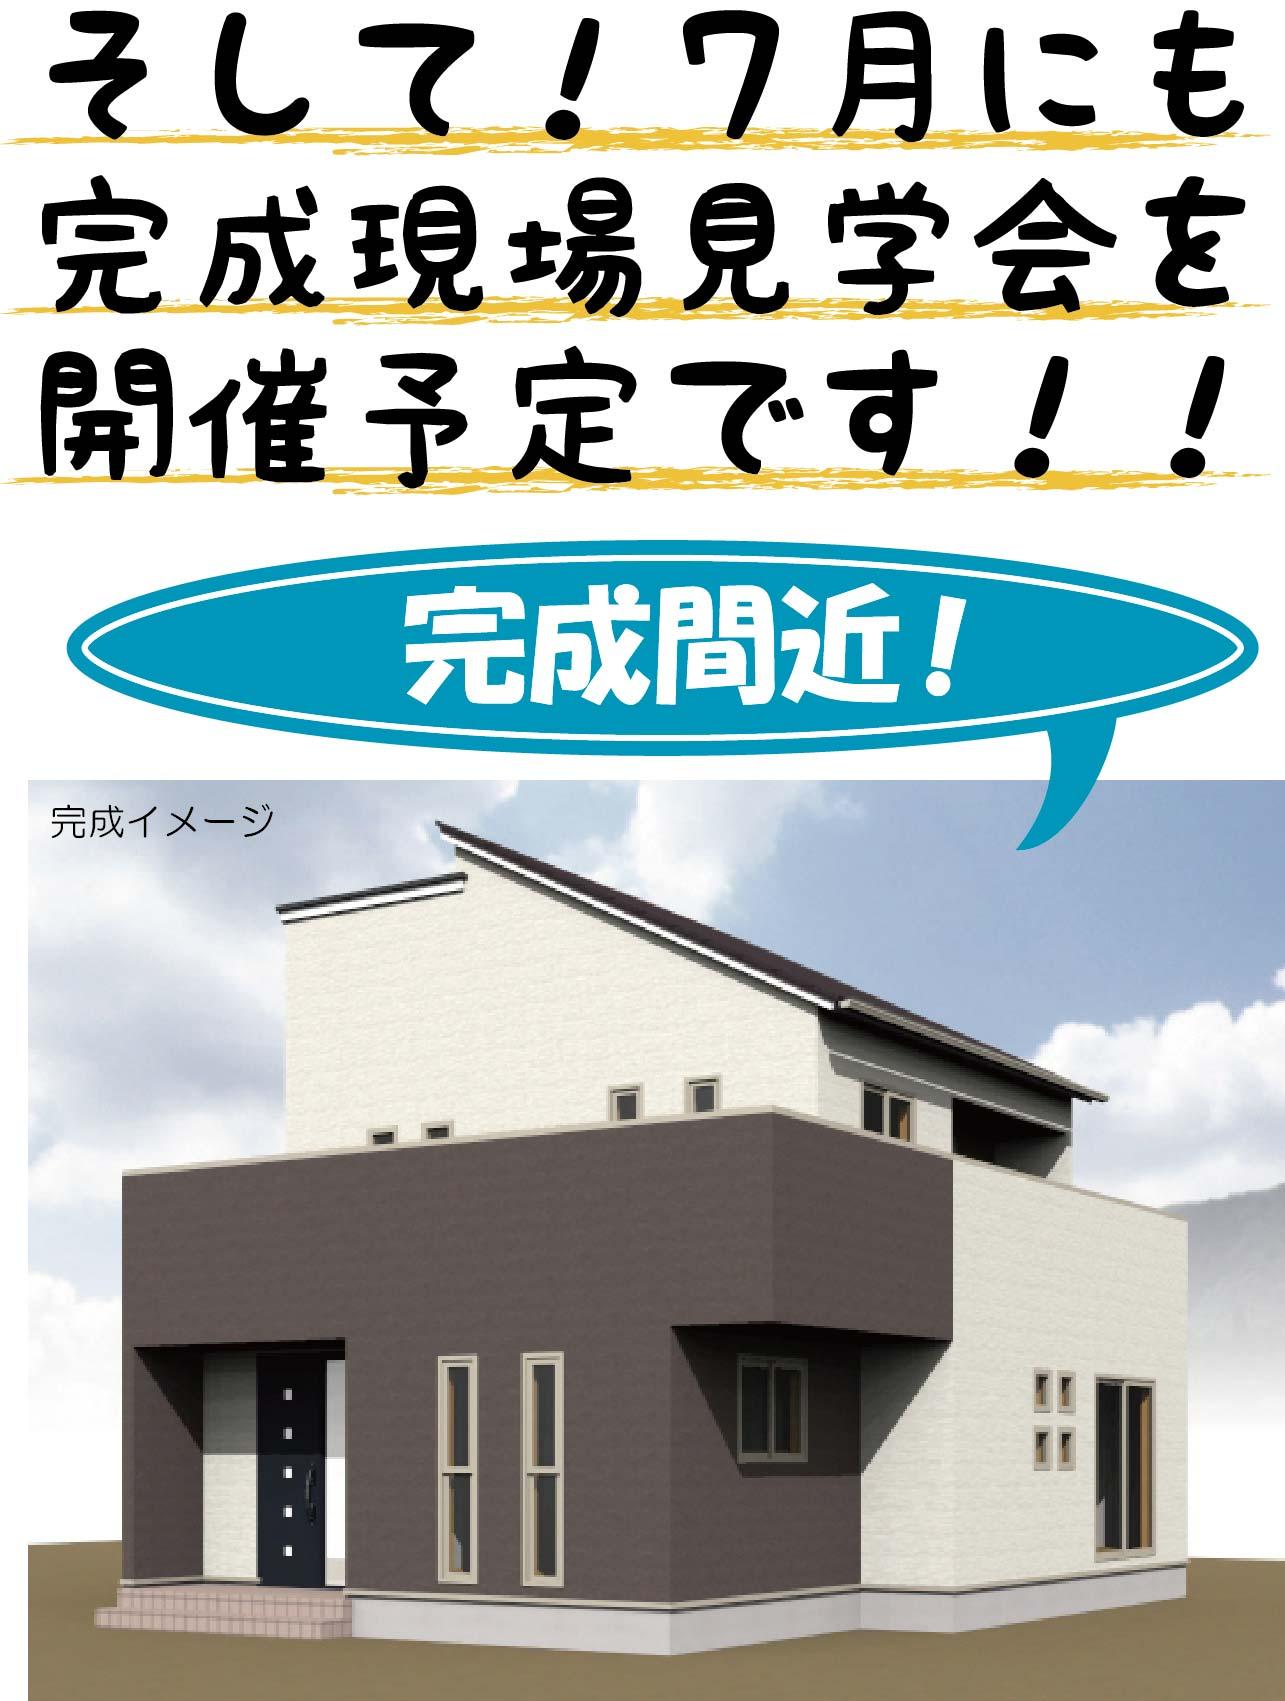 KuraSi-natu-sin85-10.jpg